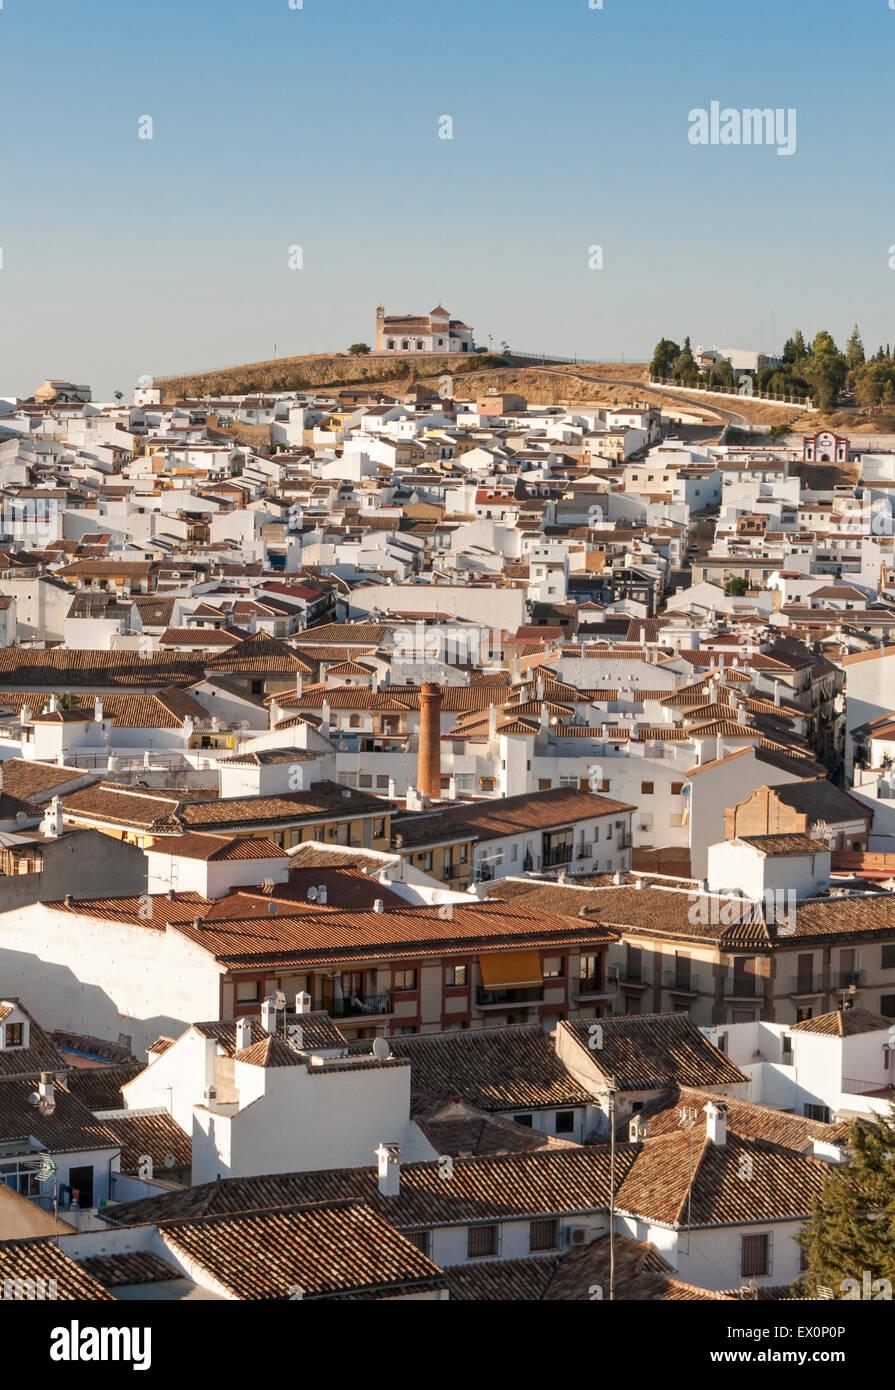 View of Town of Antequera with Hermitage of Vera Cruz (Ermita de la Veracruz), Andalusia, Spain - Stock Image